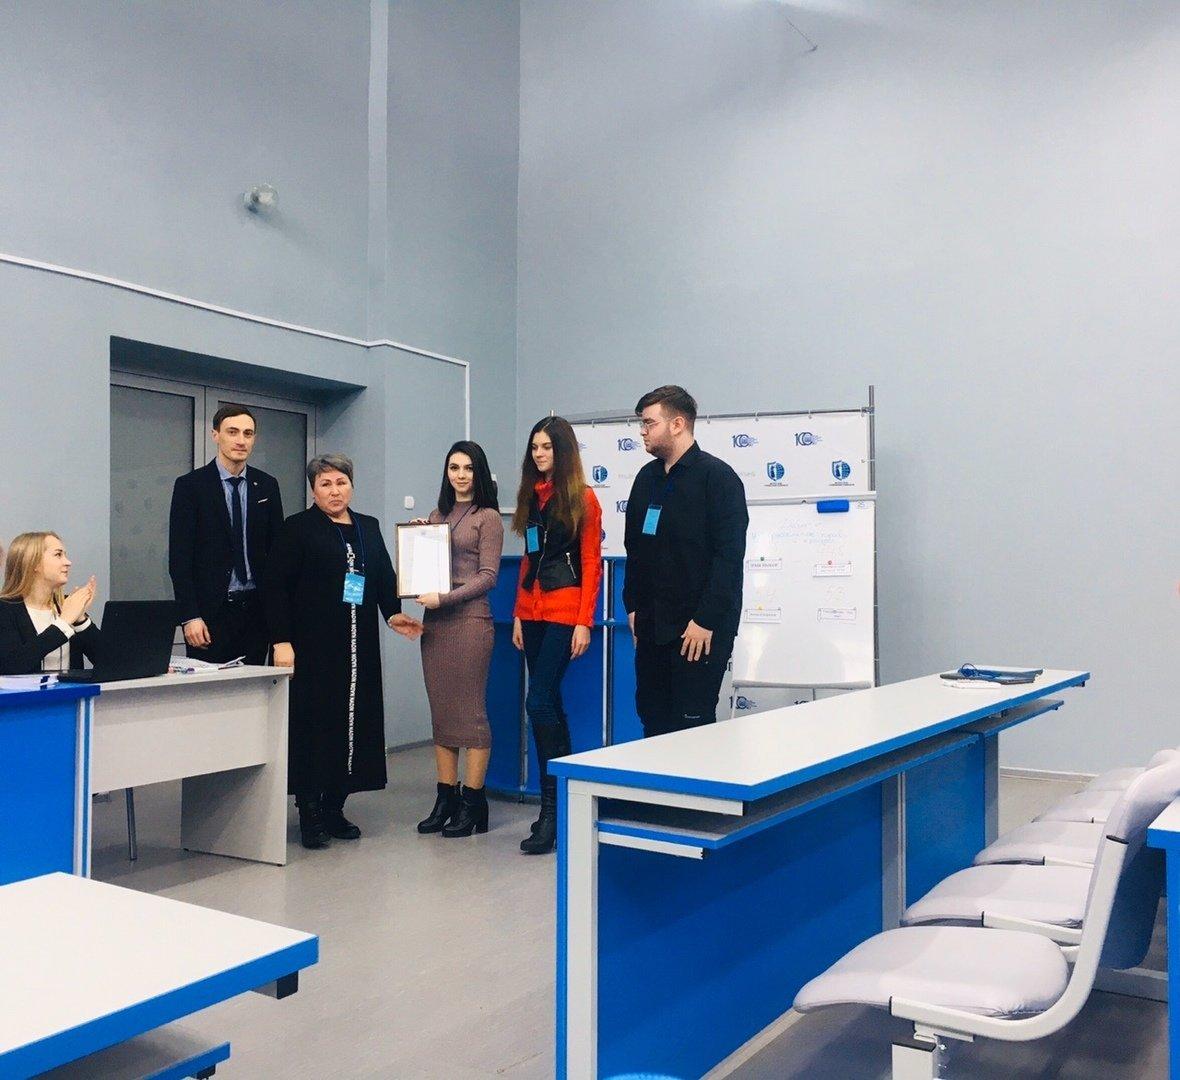 Команда Тамбовского филиала РАНХиГС заняла первое место в дебатах, фото-2